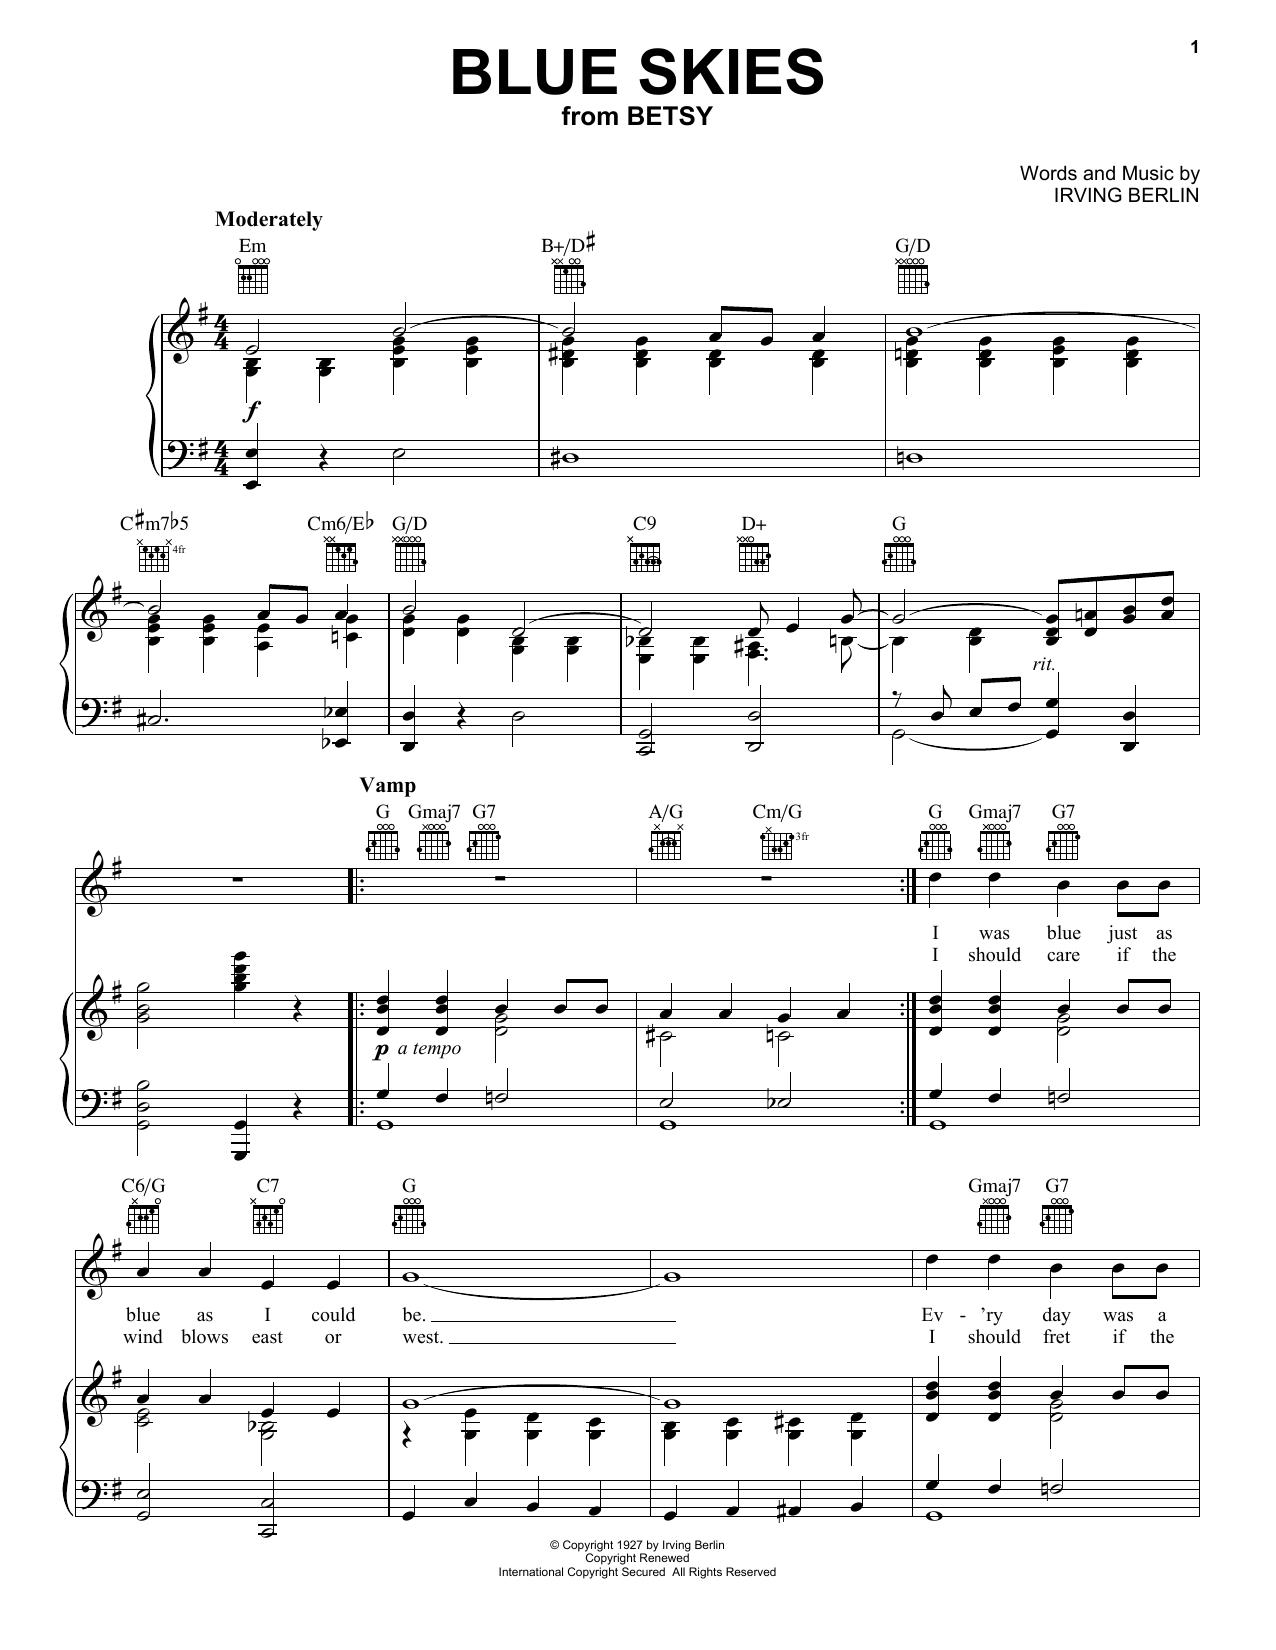 Frank Sinatra Blue Skies Sheet Music Notes Chords